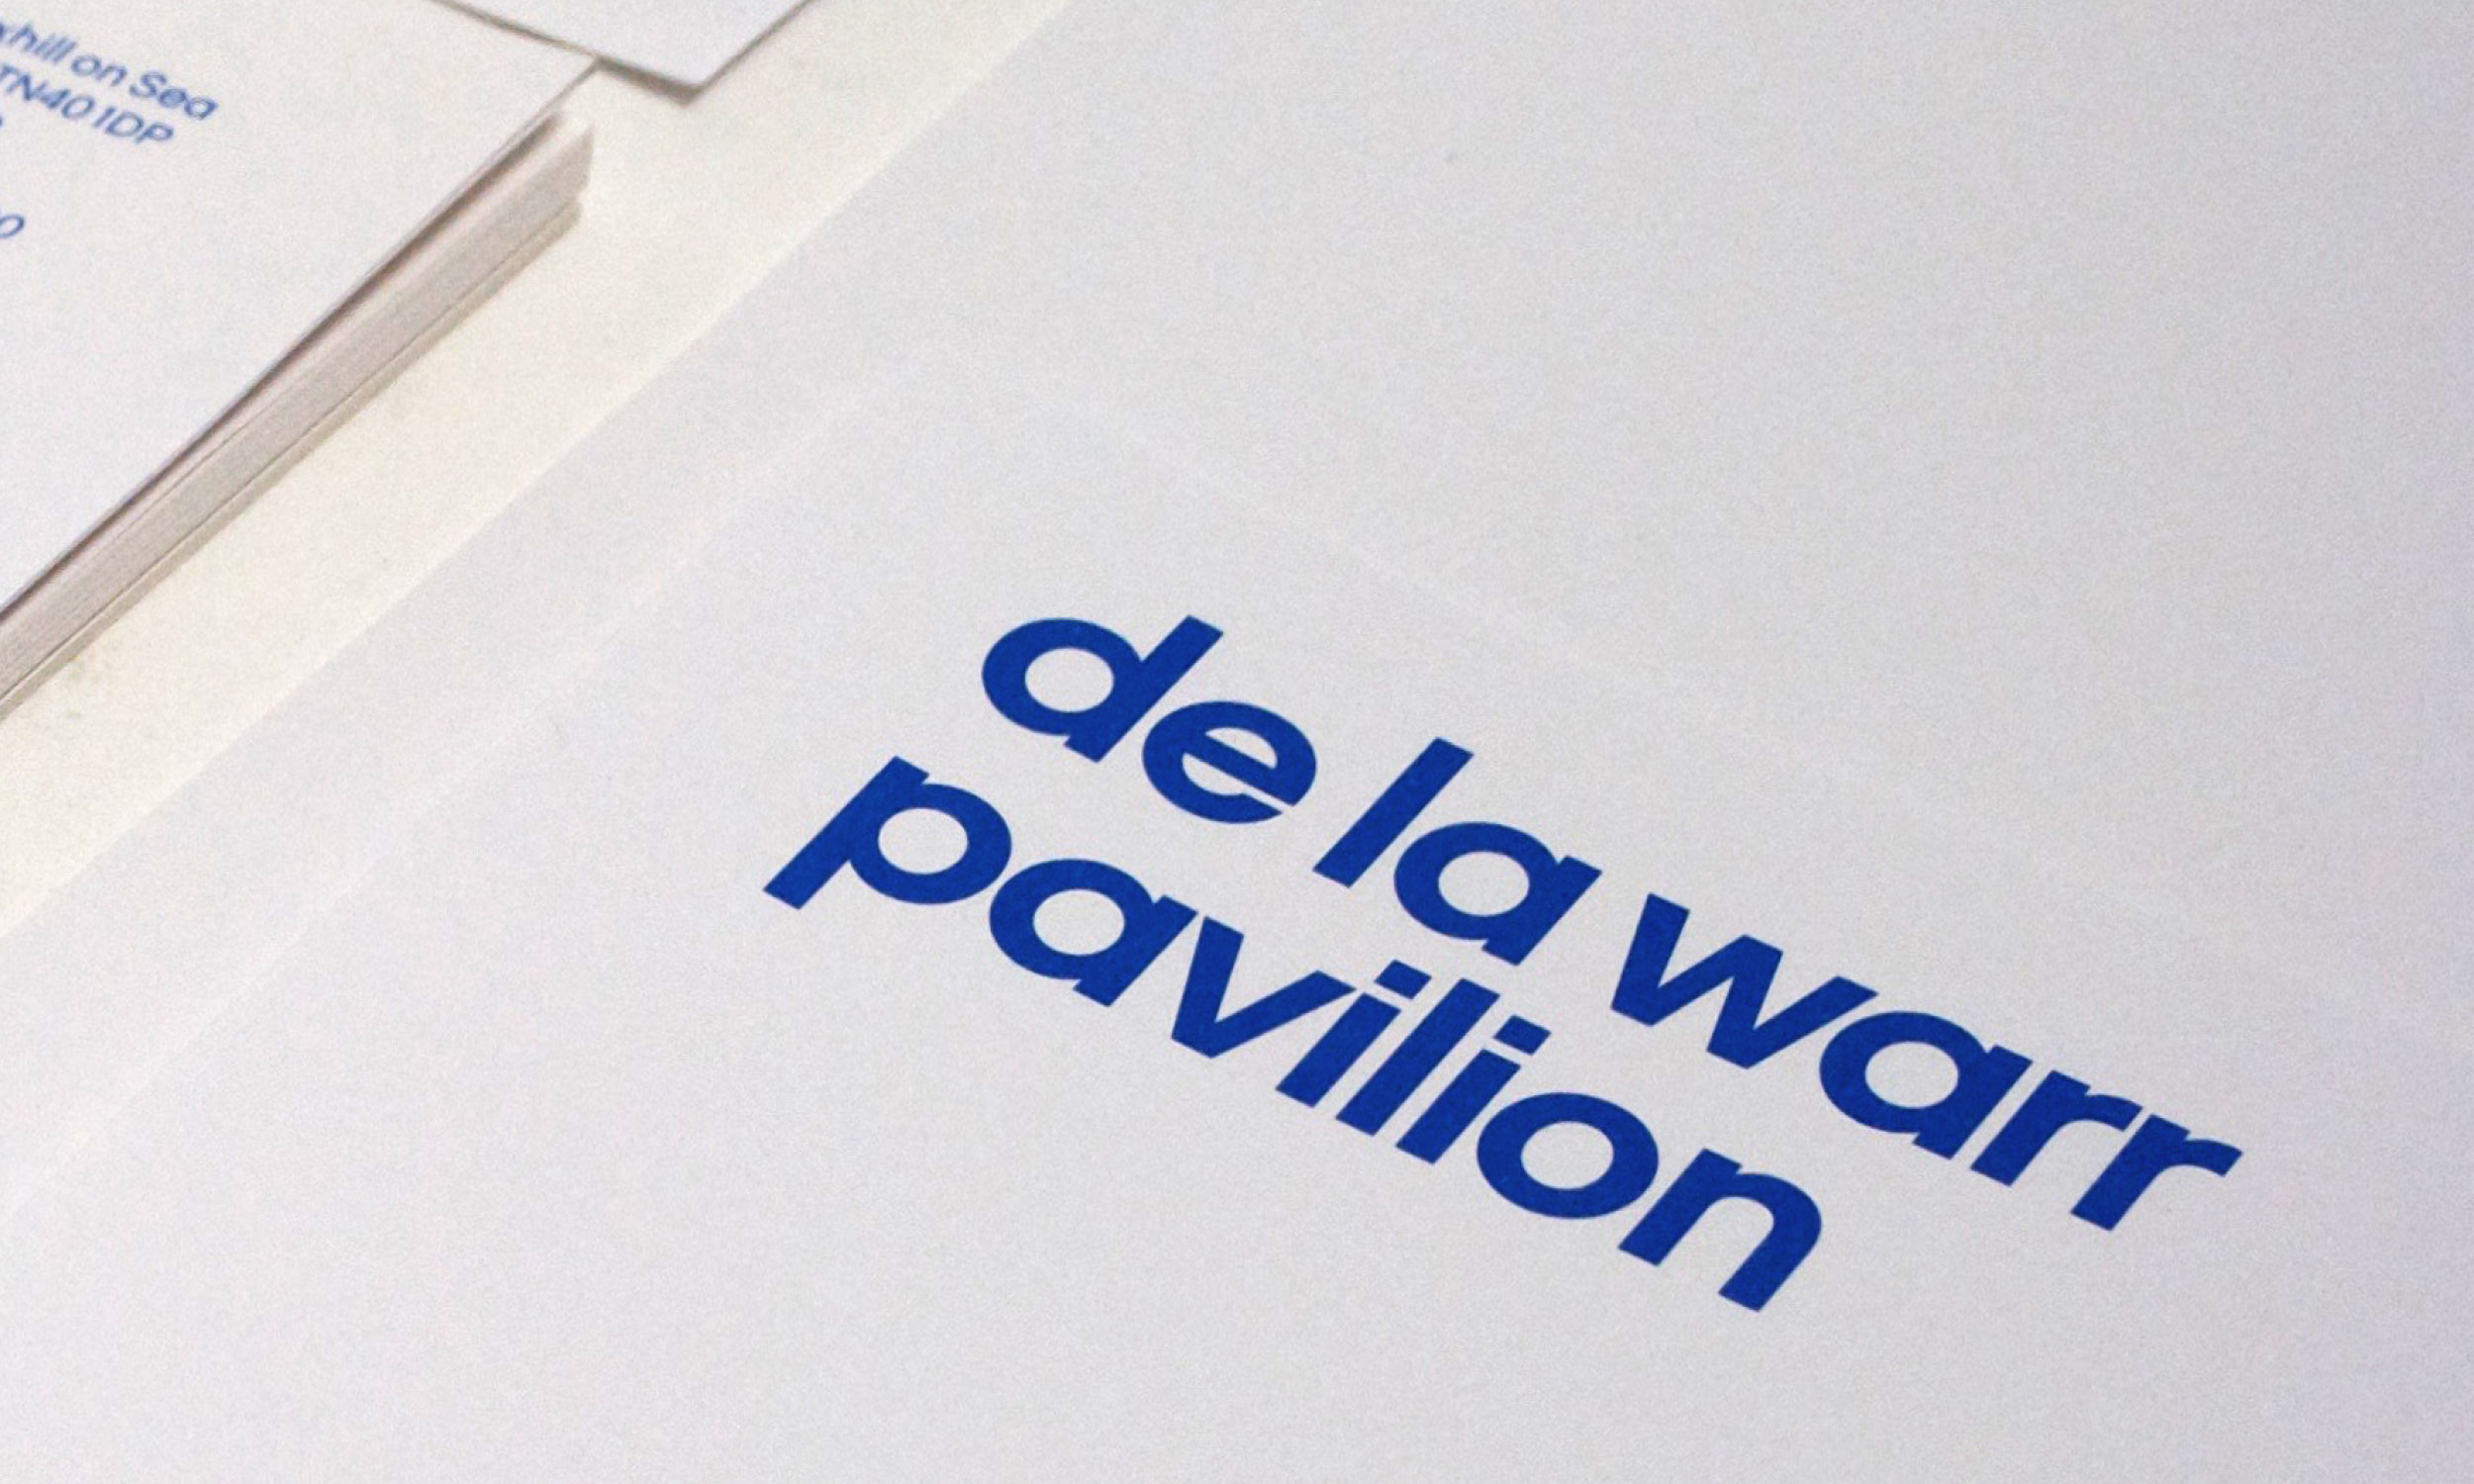 Logos-DLWP-LR1.jpg